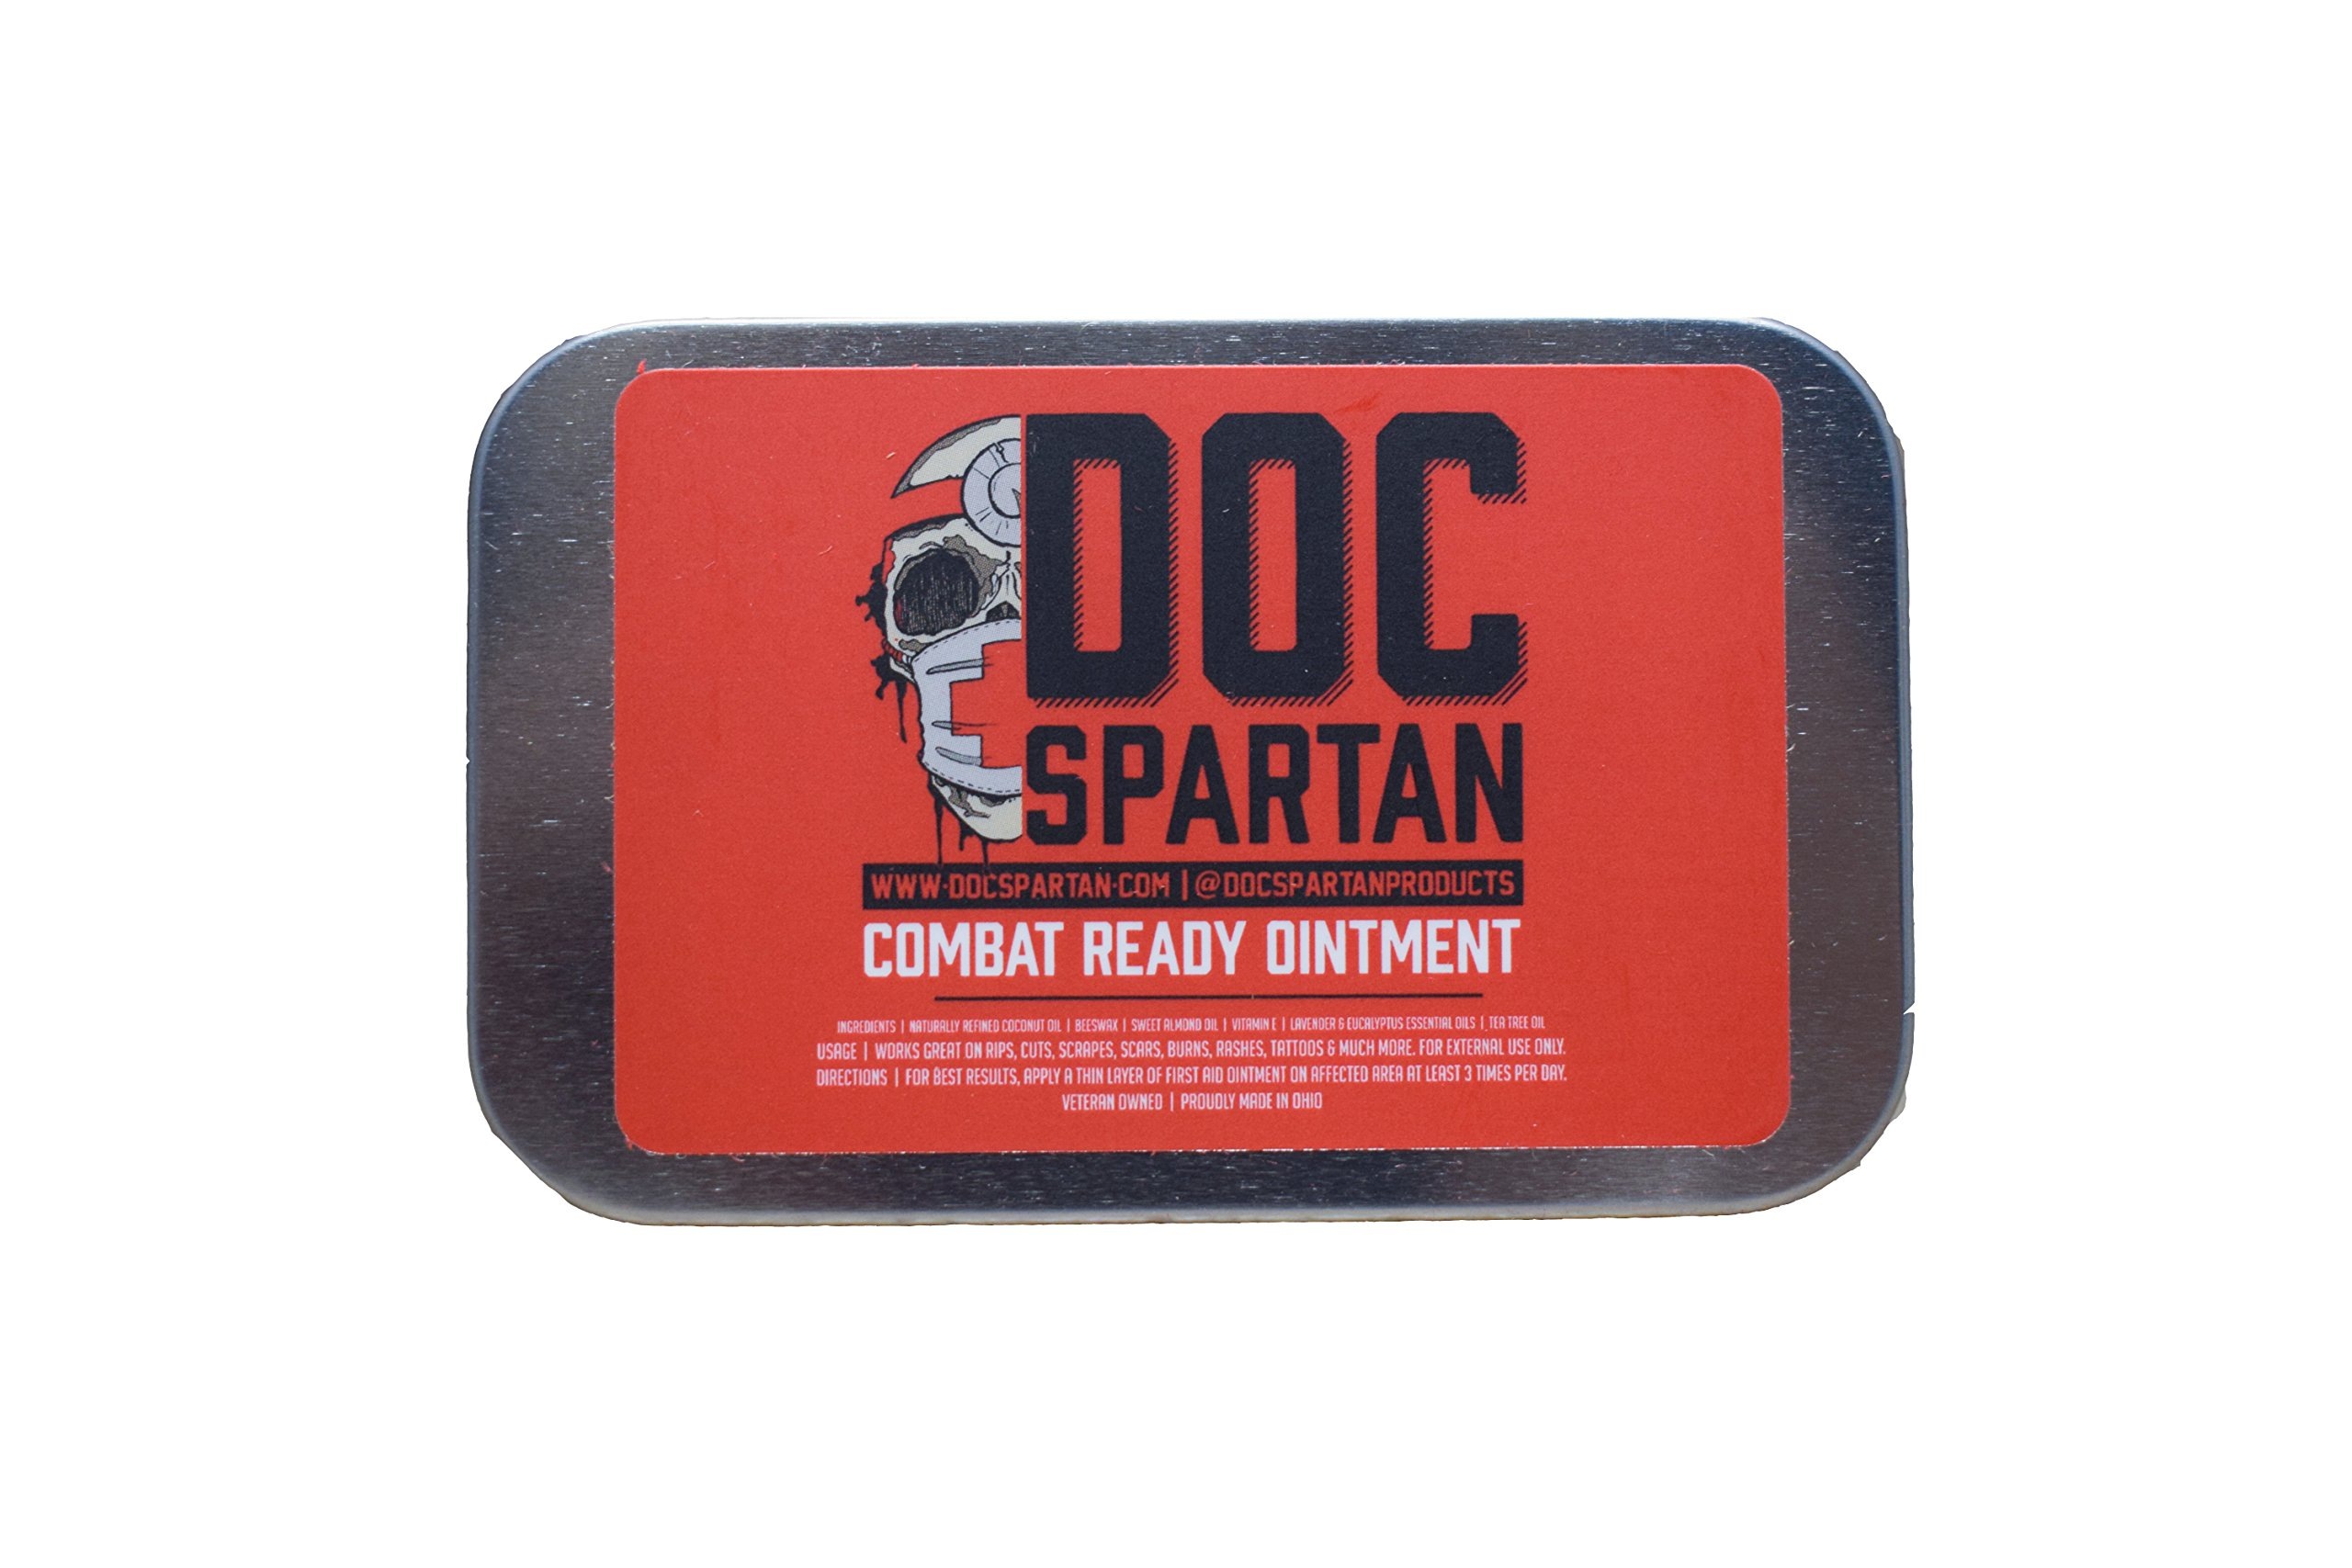 Doc Spartan Combat Ready Ointment As Seen On Shark Tank ... (Big Tin) by Doc Spartan